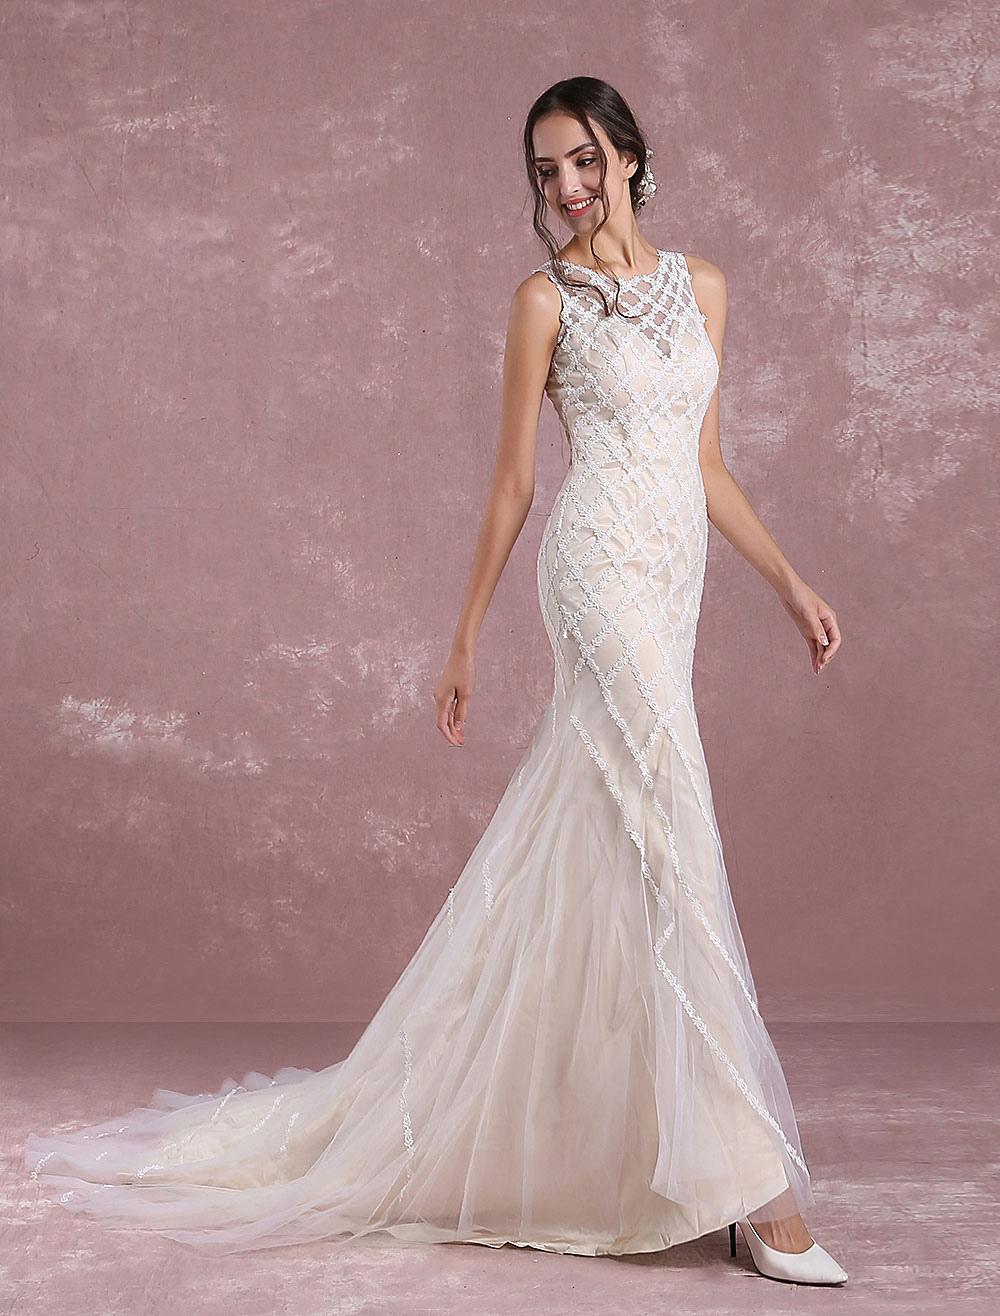 a6a7997f45b3 Vestiti da sposa di estate 2019 Champagne Mermaid Tulle Abito da sposa  Abito da sposa in ...